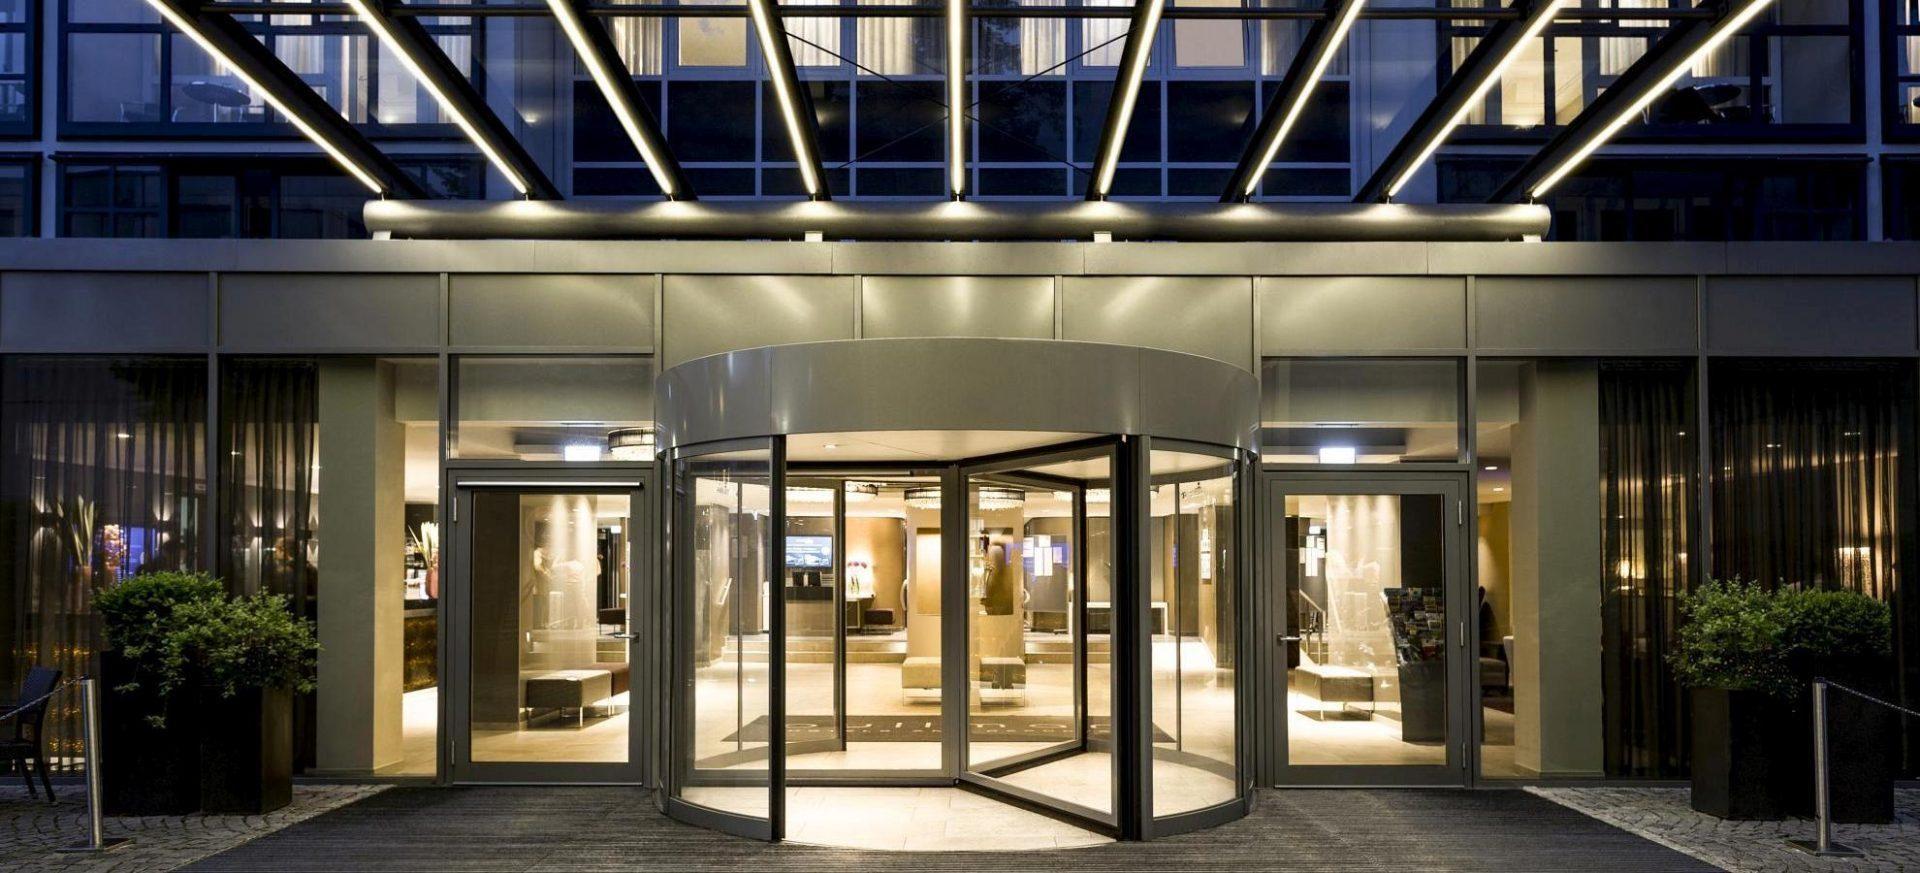 Pullman Munich Eingang / Entrance